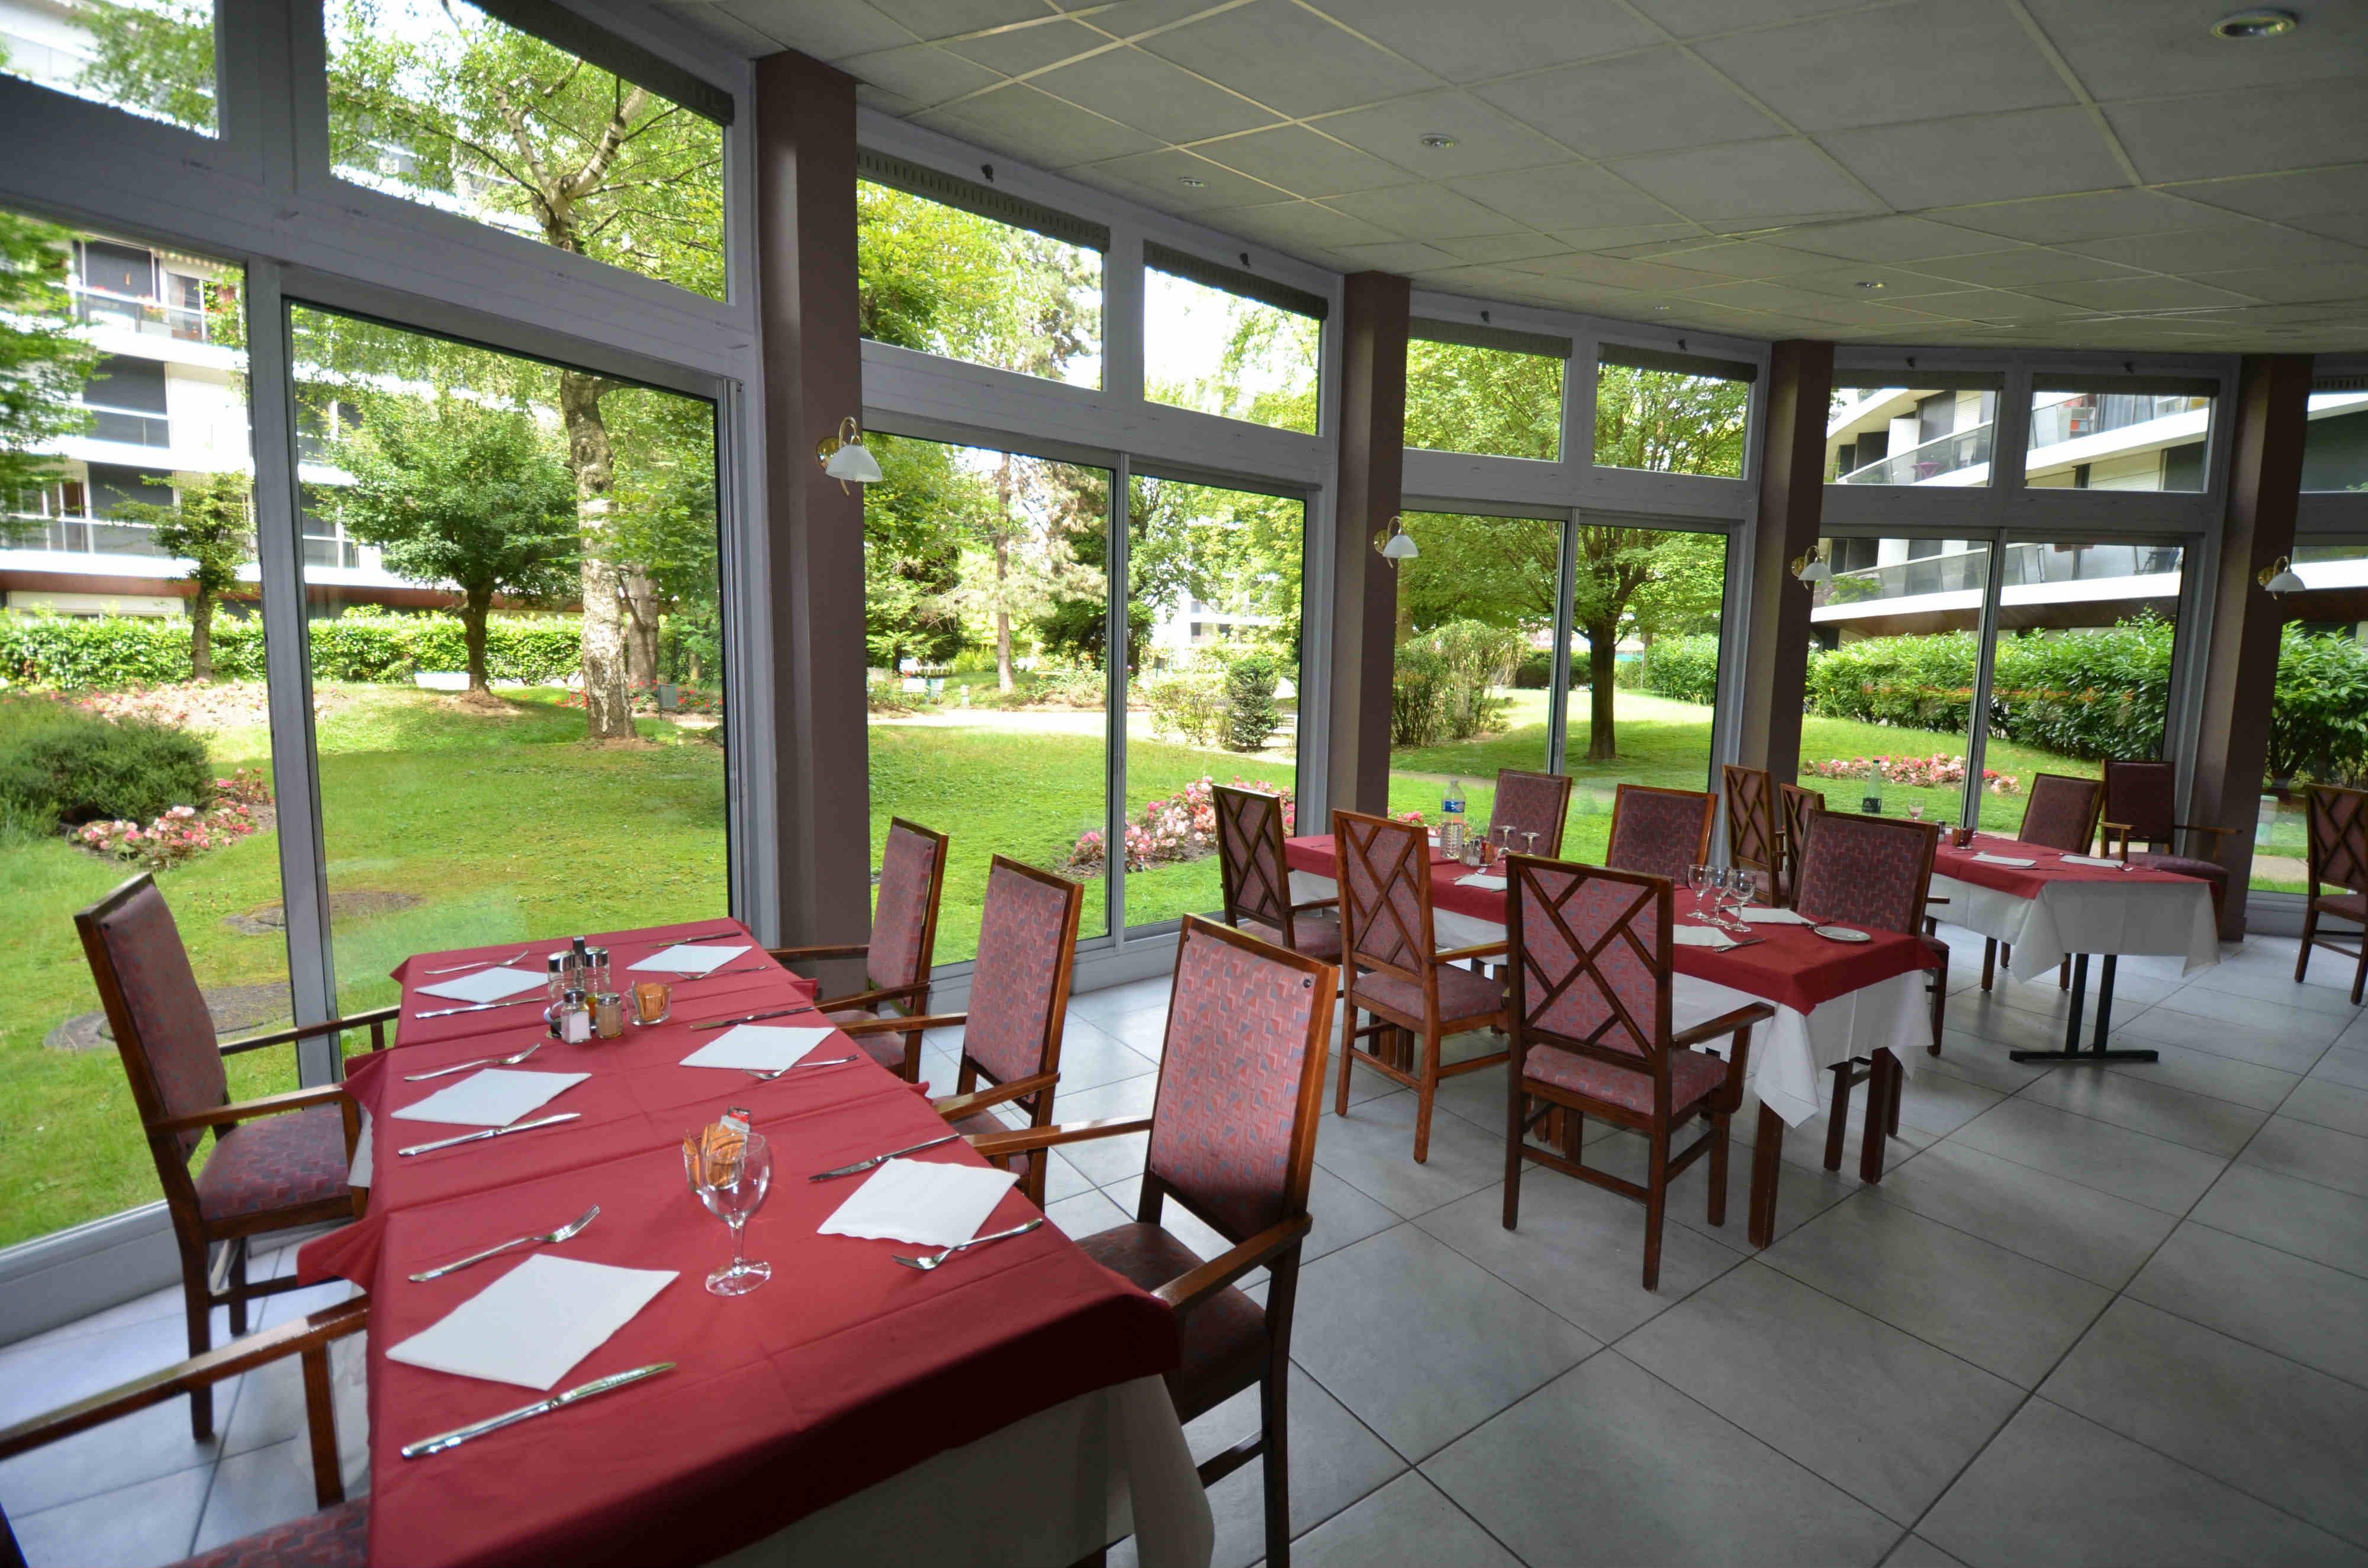 R sidence service r sidence les jardins d 39 arcadie de saint maurice residence avec services - Les jardins d arcadie st etienne ...